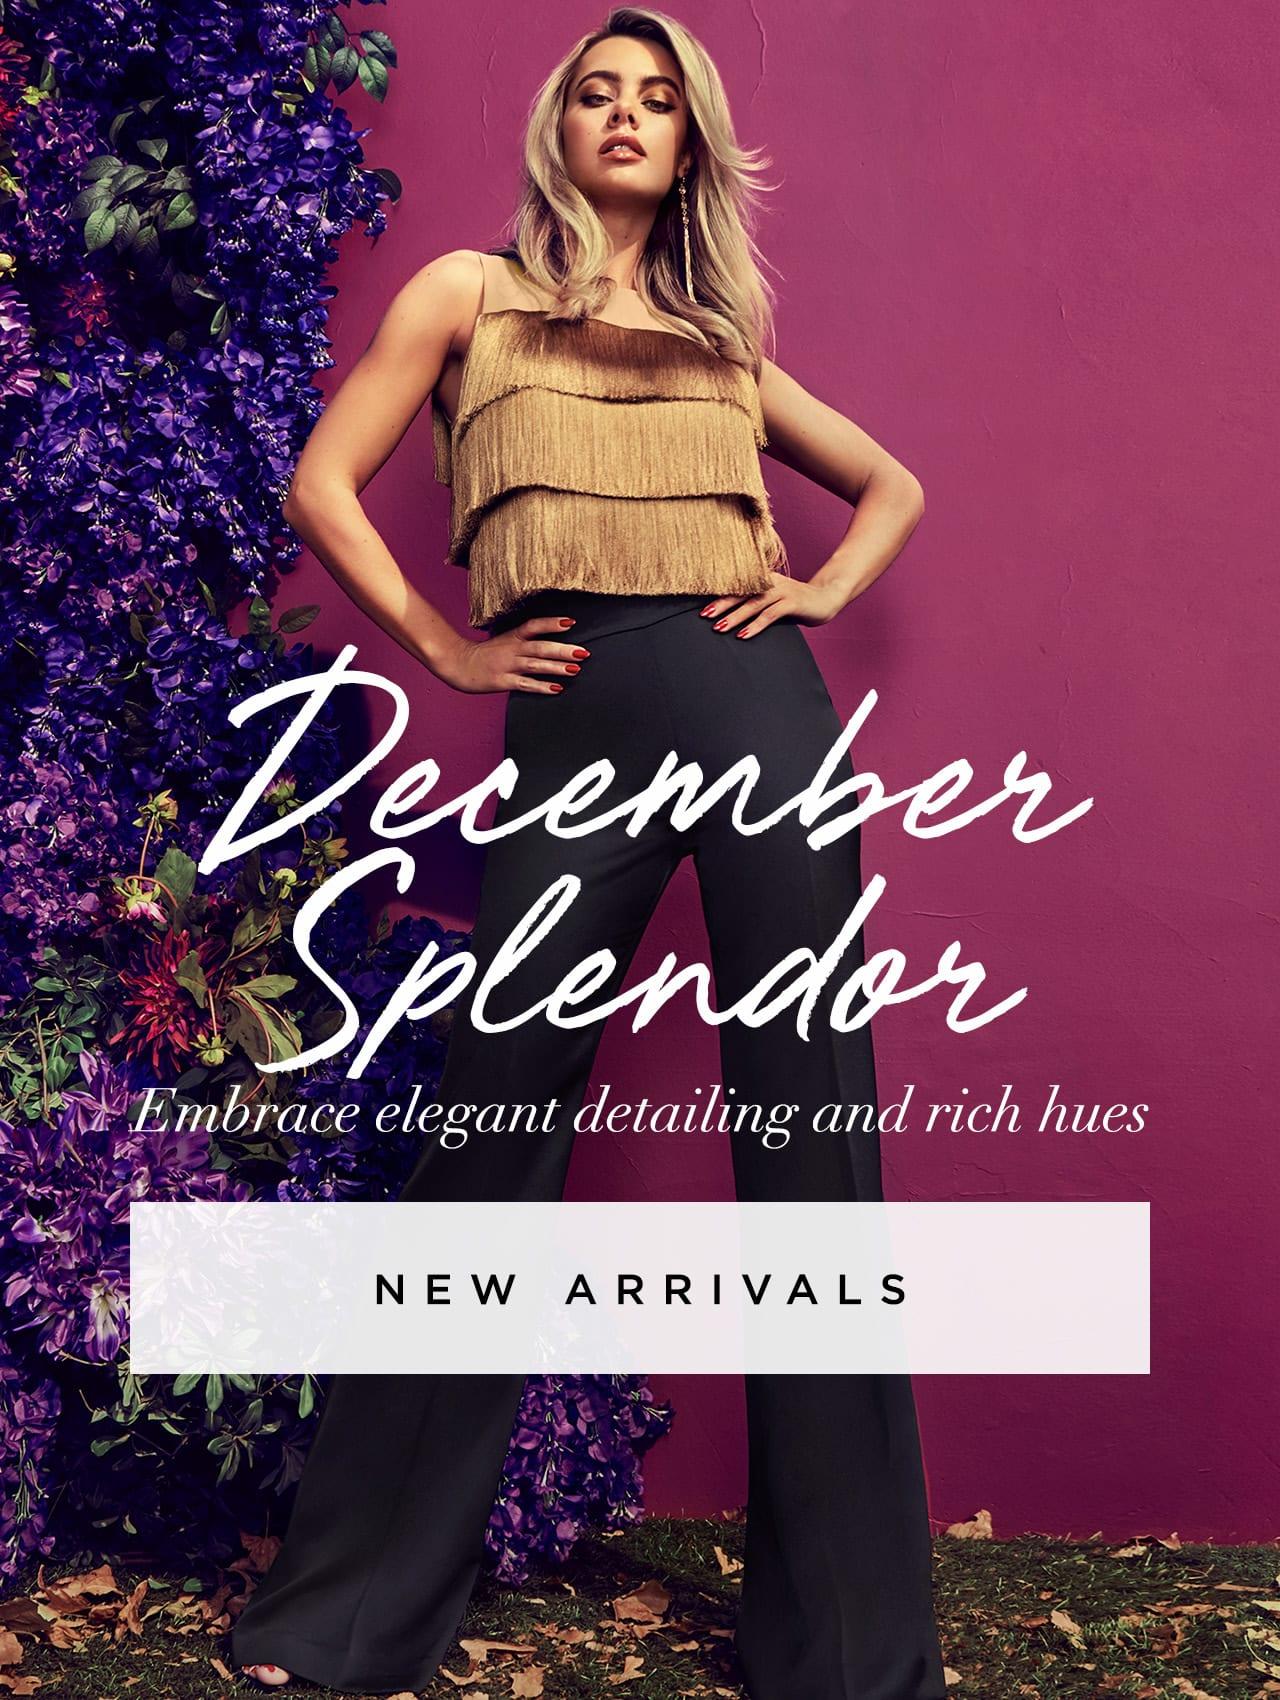 DecemberSplendor